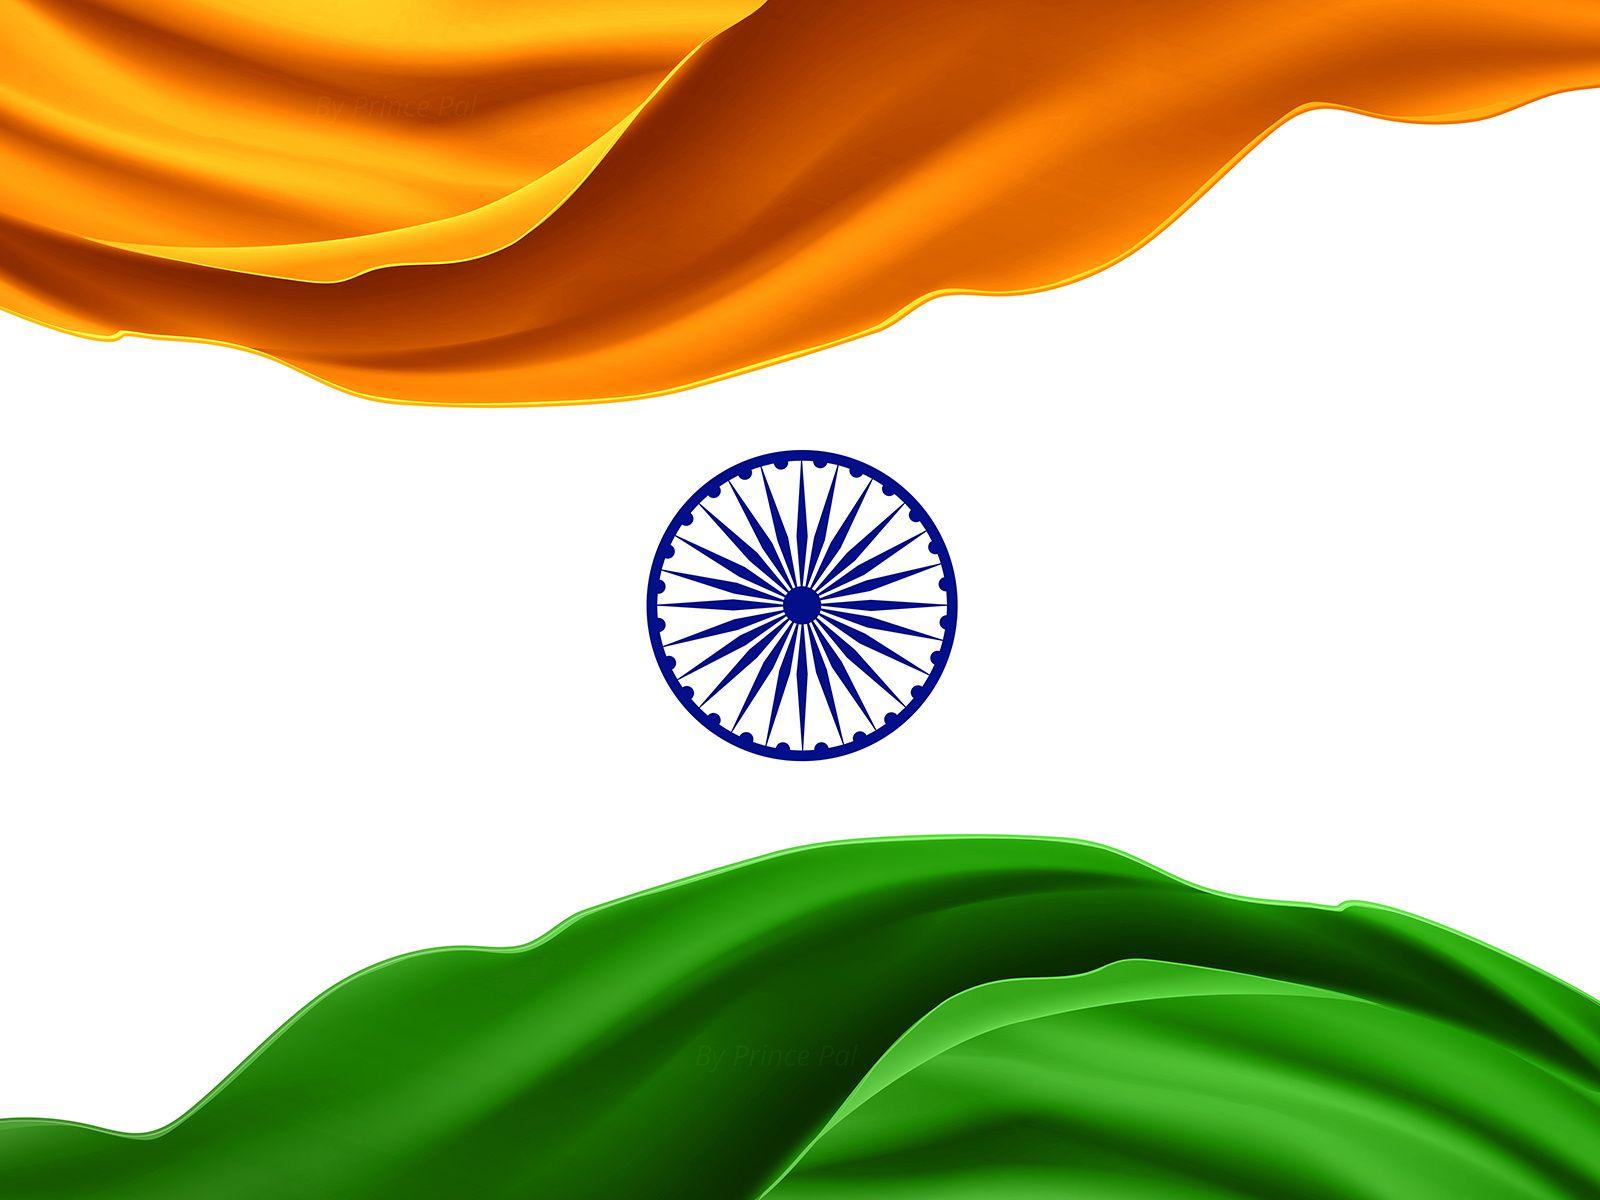 Tiranga (India Flag) Wallpaper - Art Work | India flag, Indian flag  wallpaper, Art wallpaper